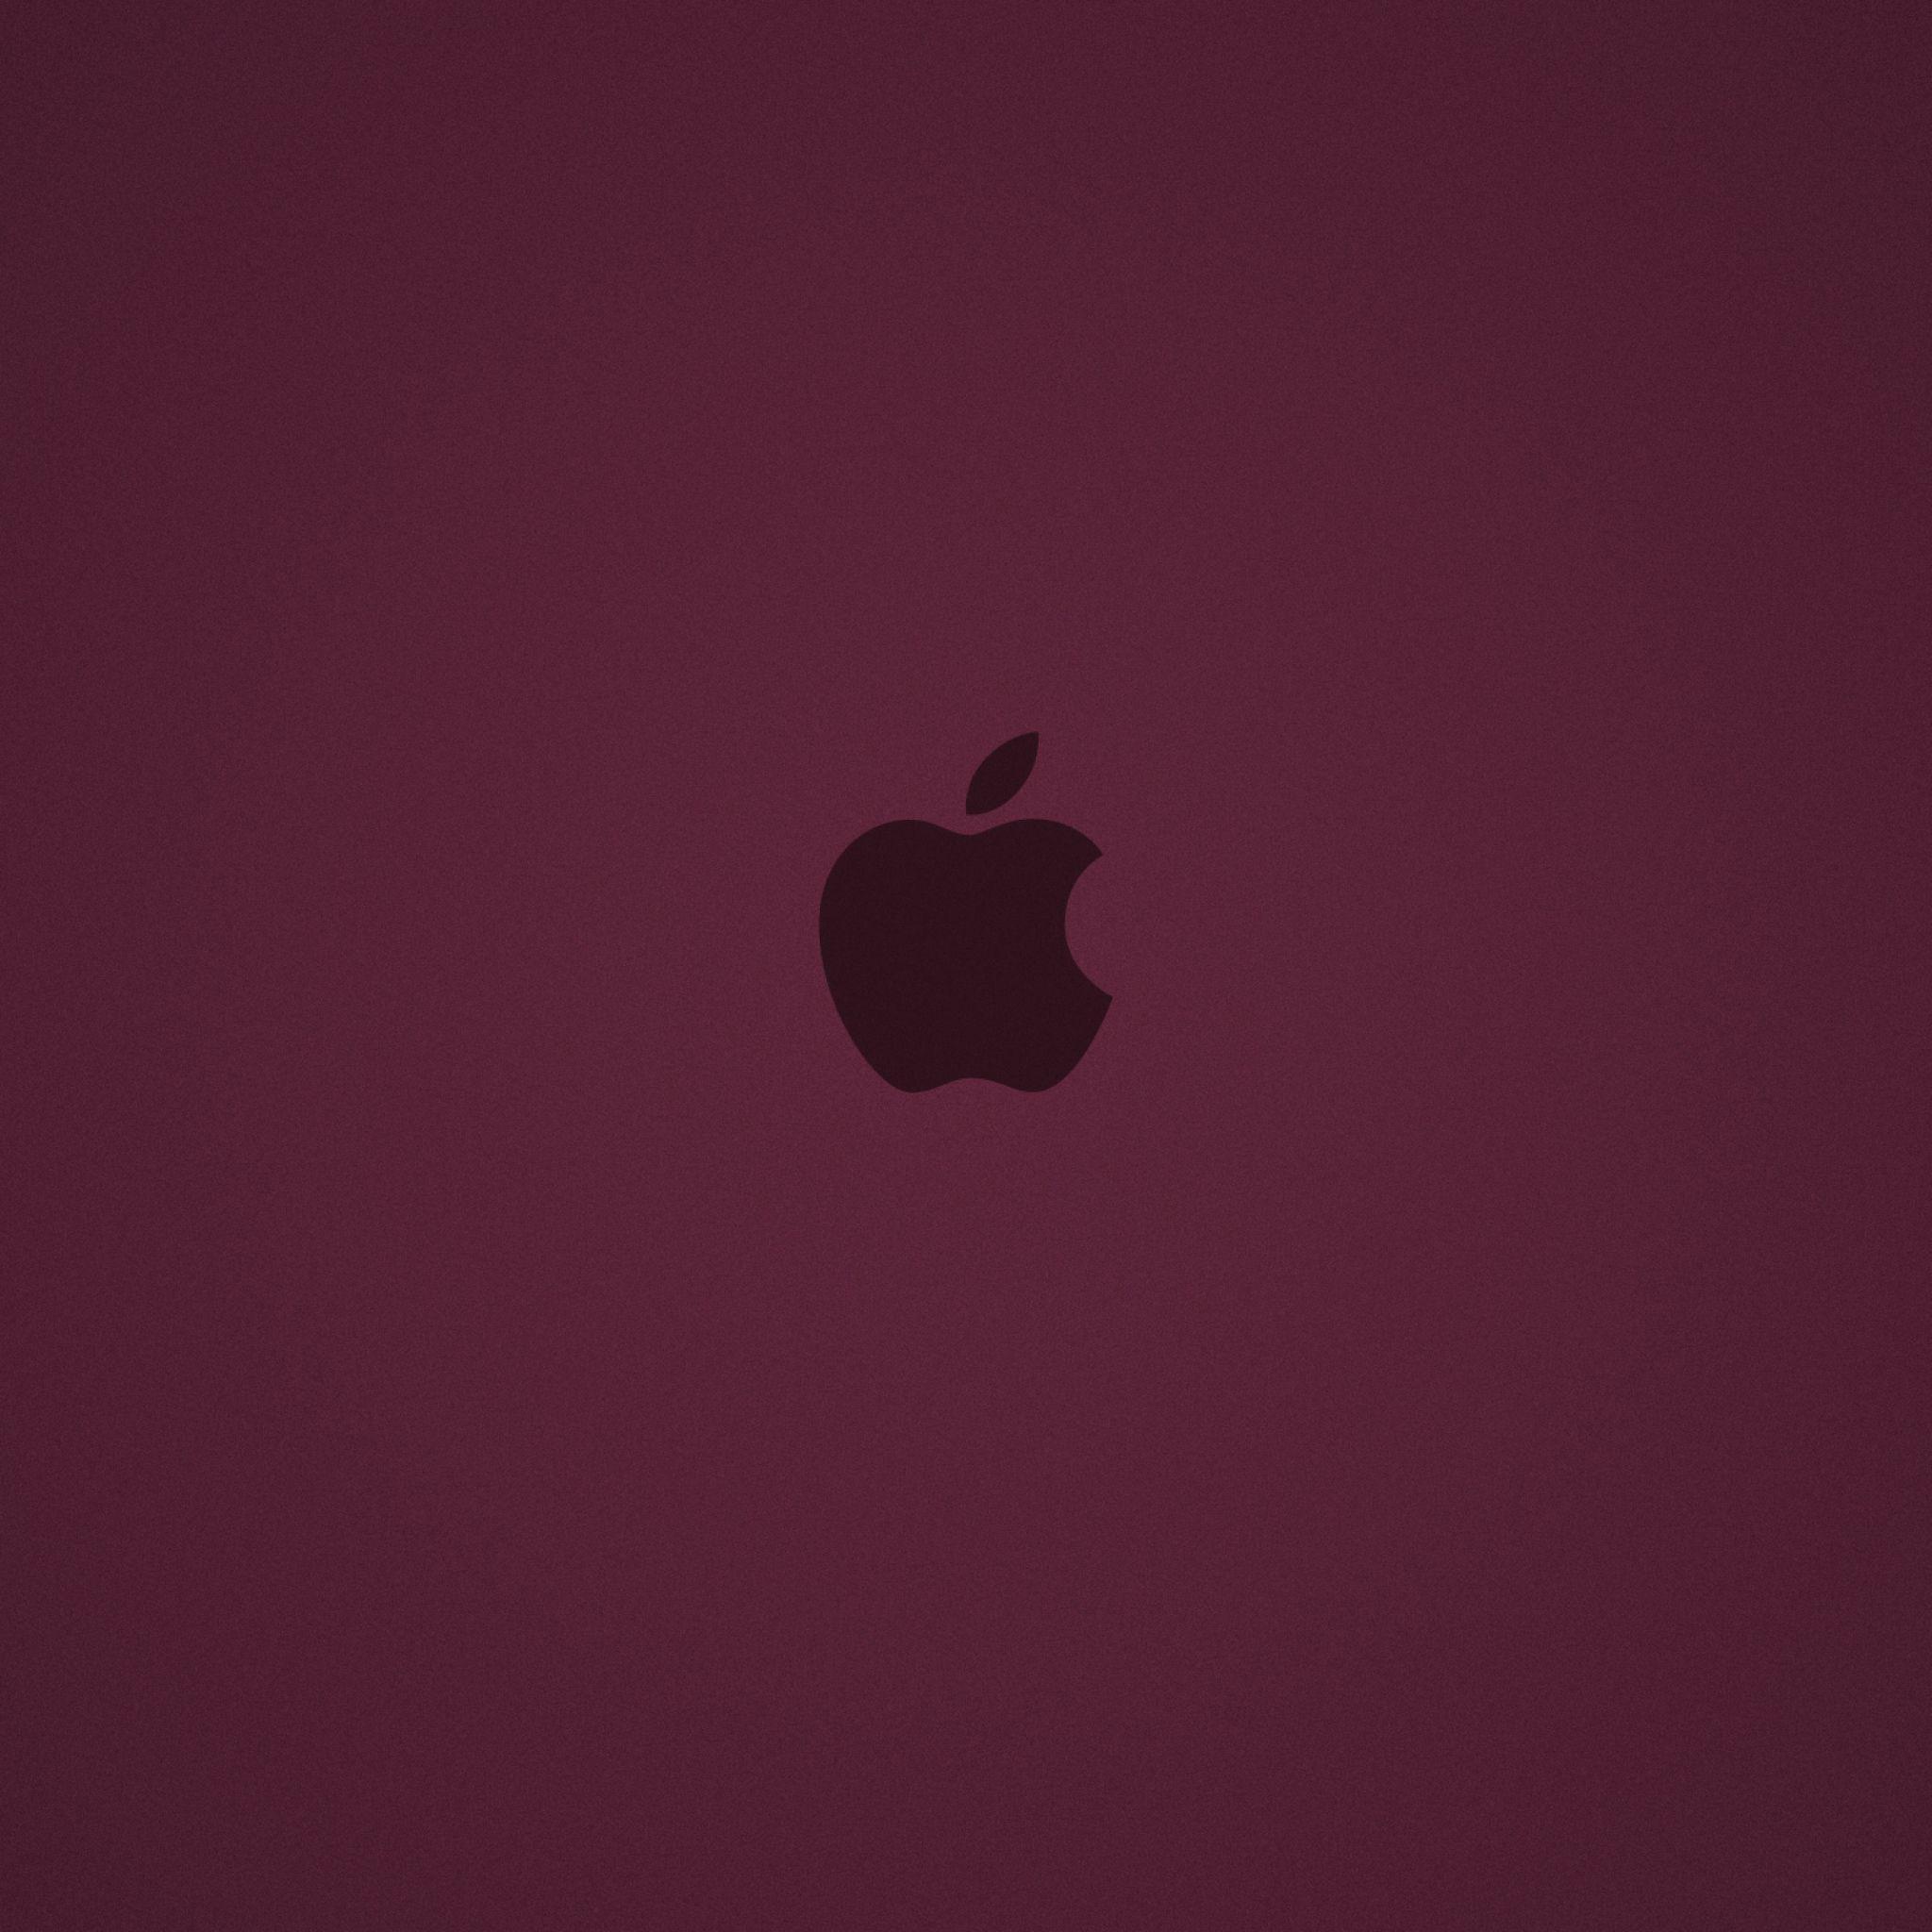 2048x2048 wallpaper apple, mac, brand, background, logo, dark